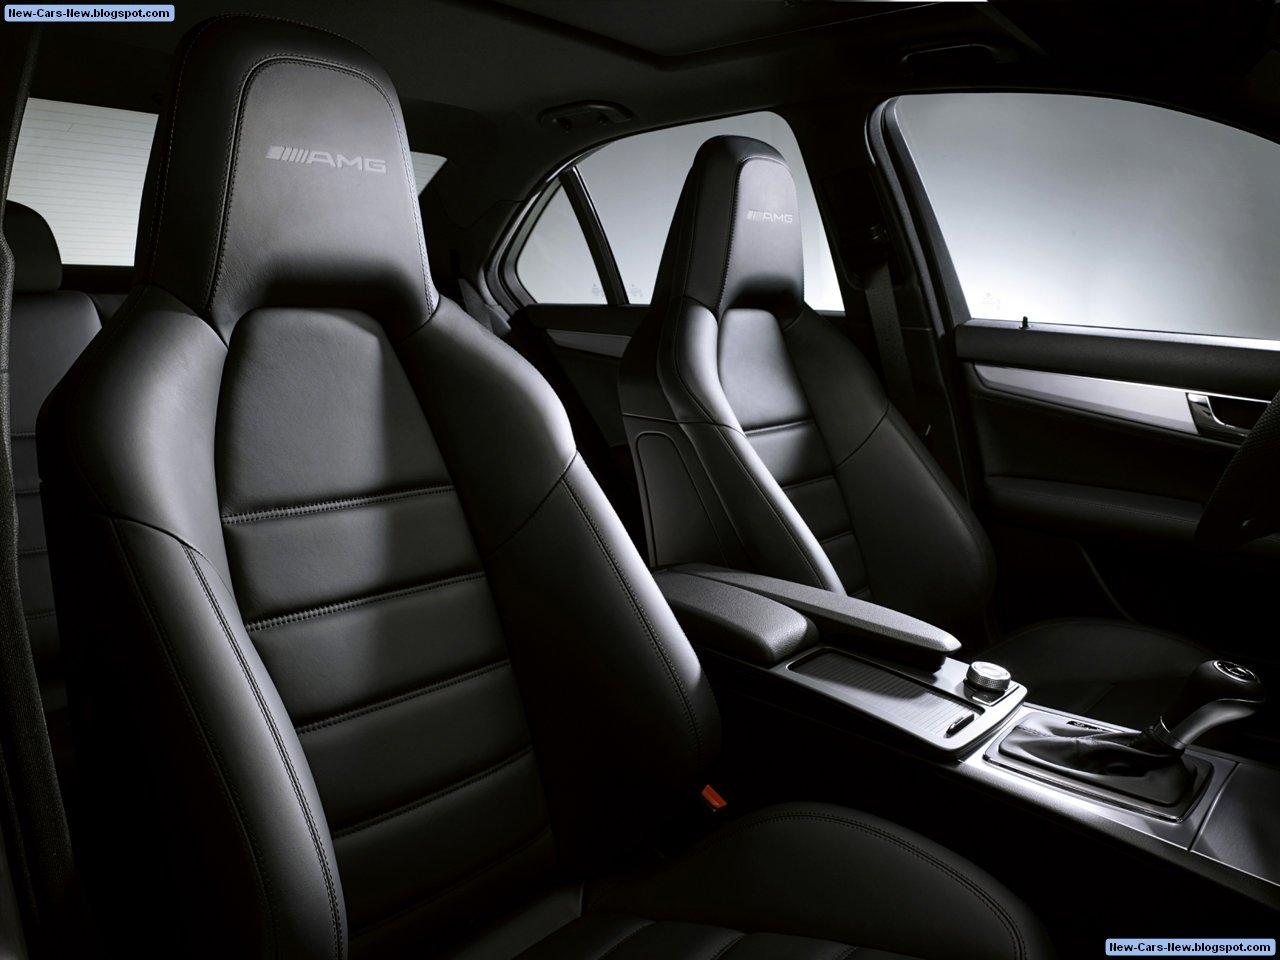 http://4.bp.blogspot.com/_U4w592tUDHM/TB22ezt1gnI/AAAAAAAAAN8/NSDa72GurDQ/s1600/Mercedes-Benz-C63_AMG_2008_1280x960_wallpaper_09.jpg